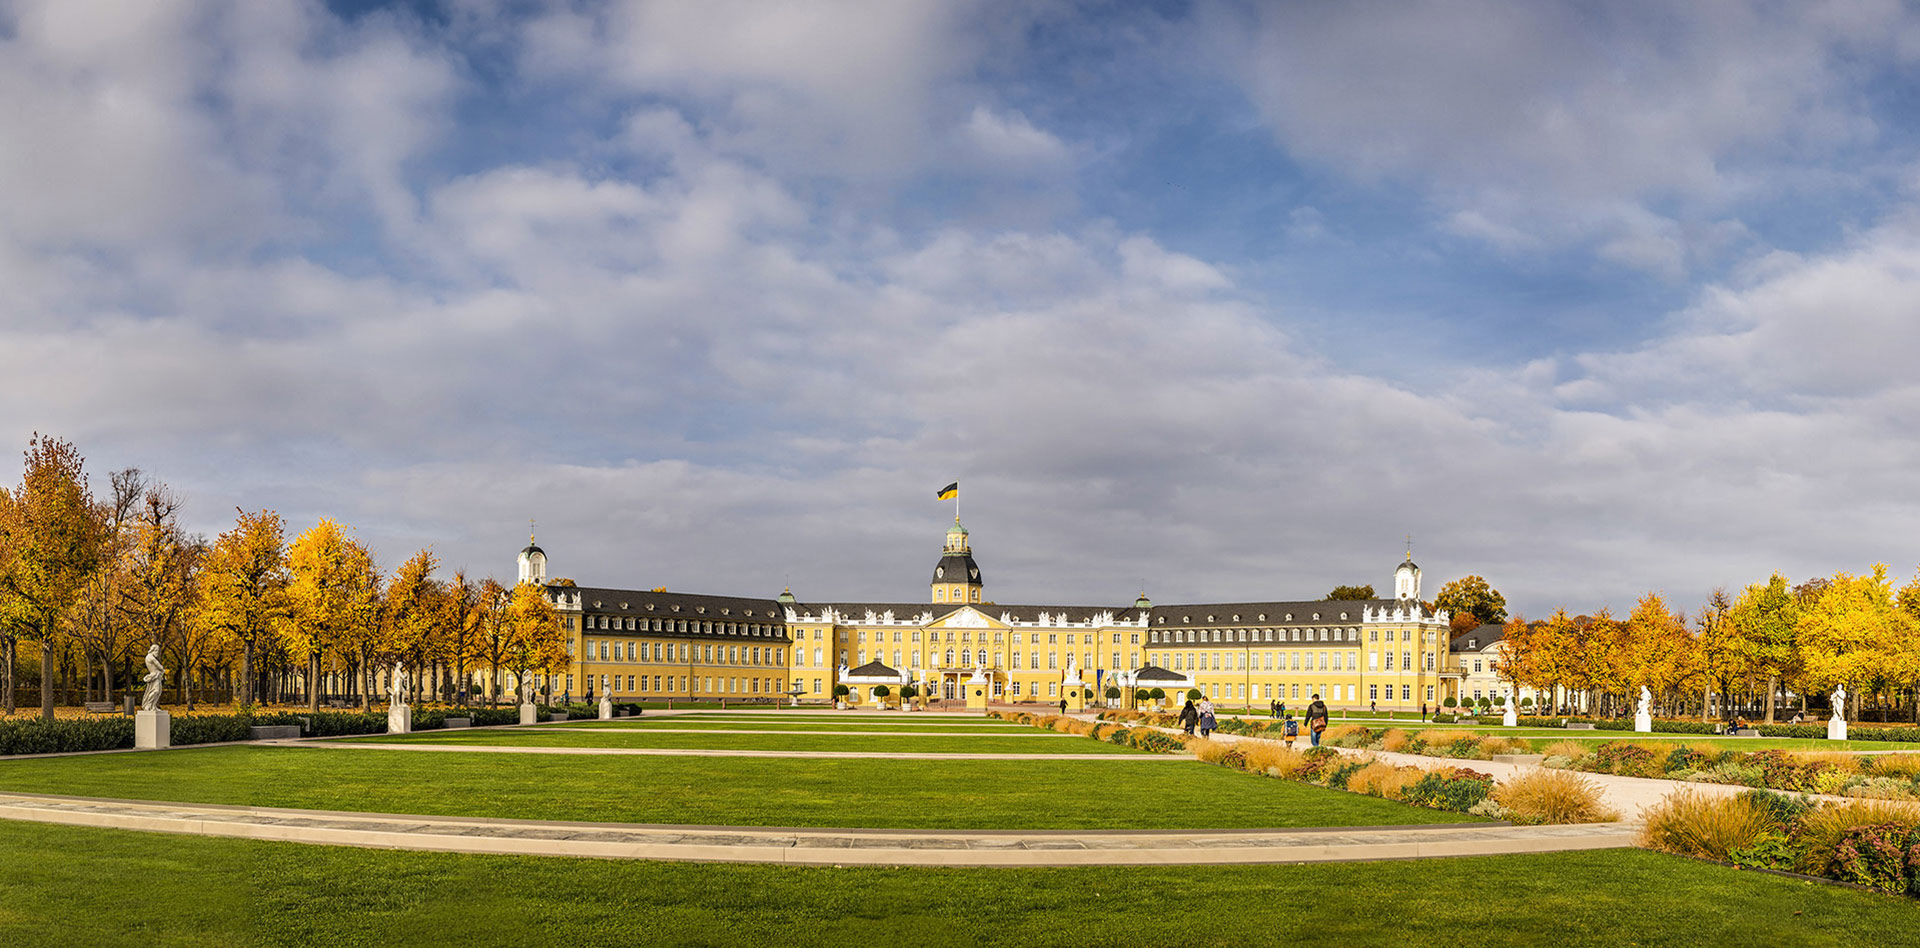 Jäger Haustechnik aus Karlsruhe (Schloss)